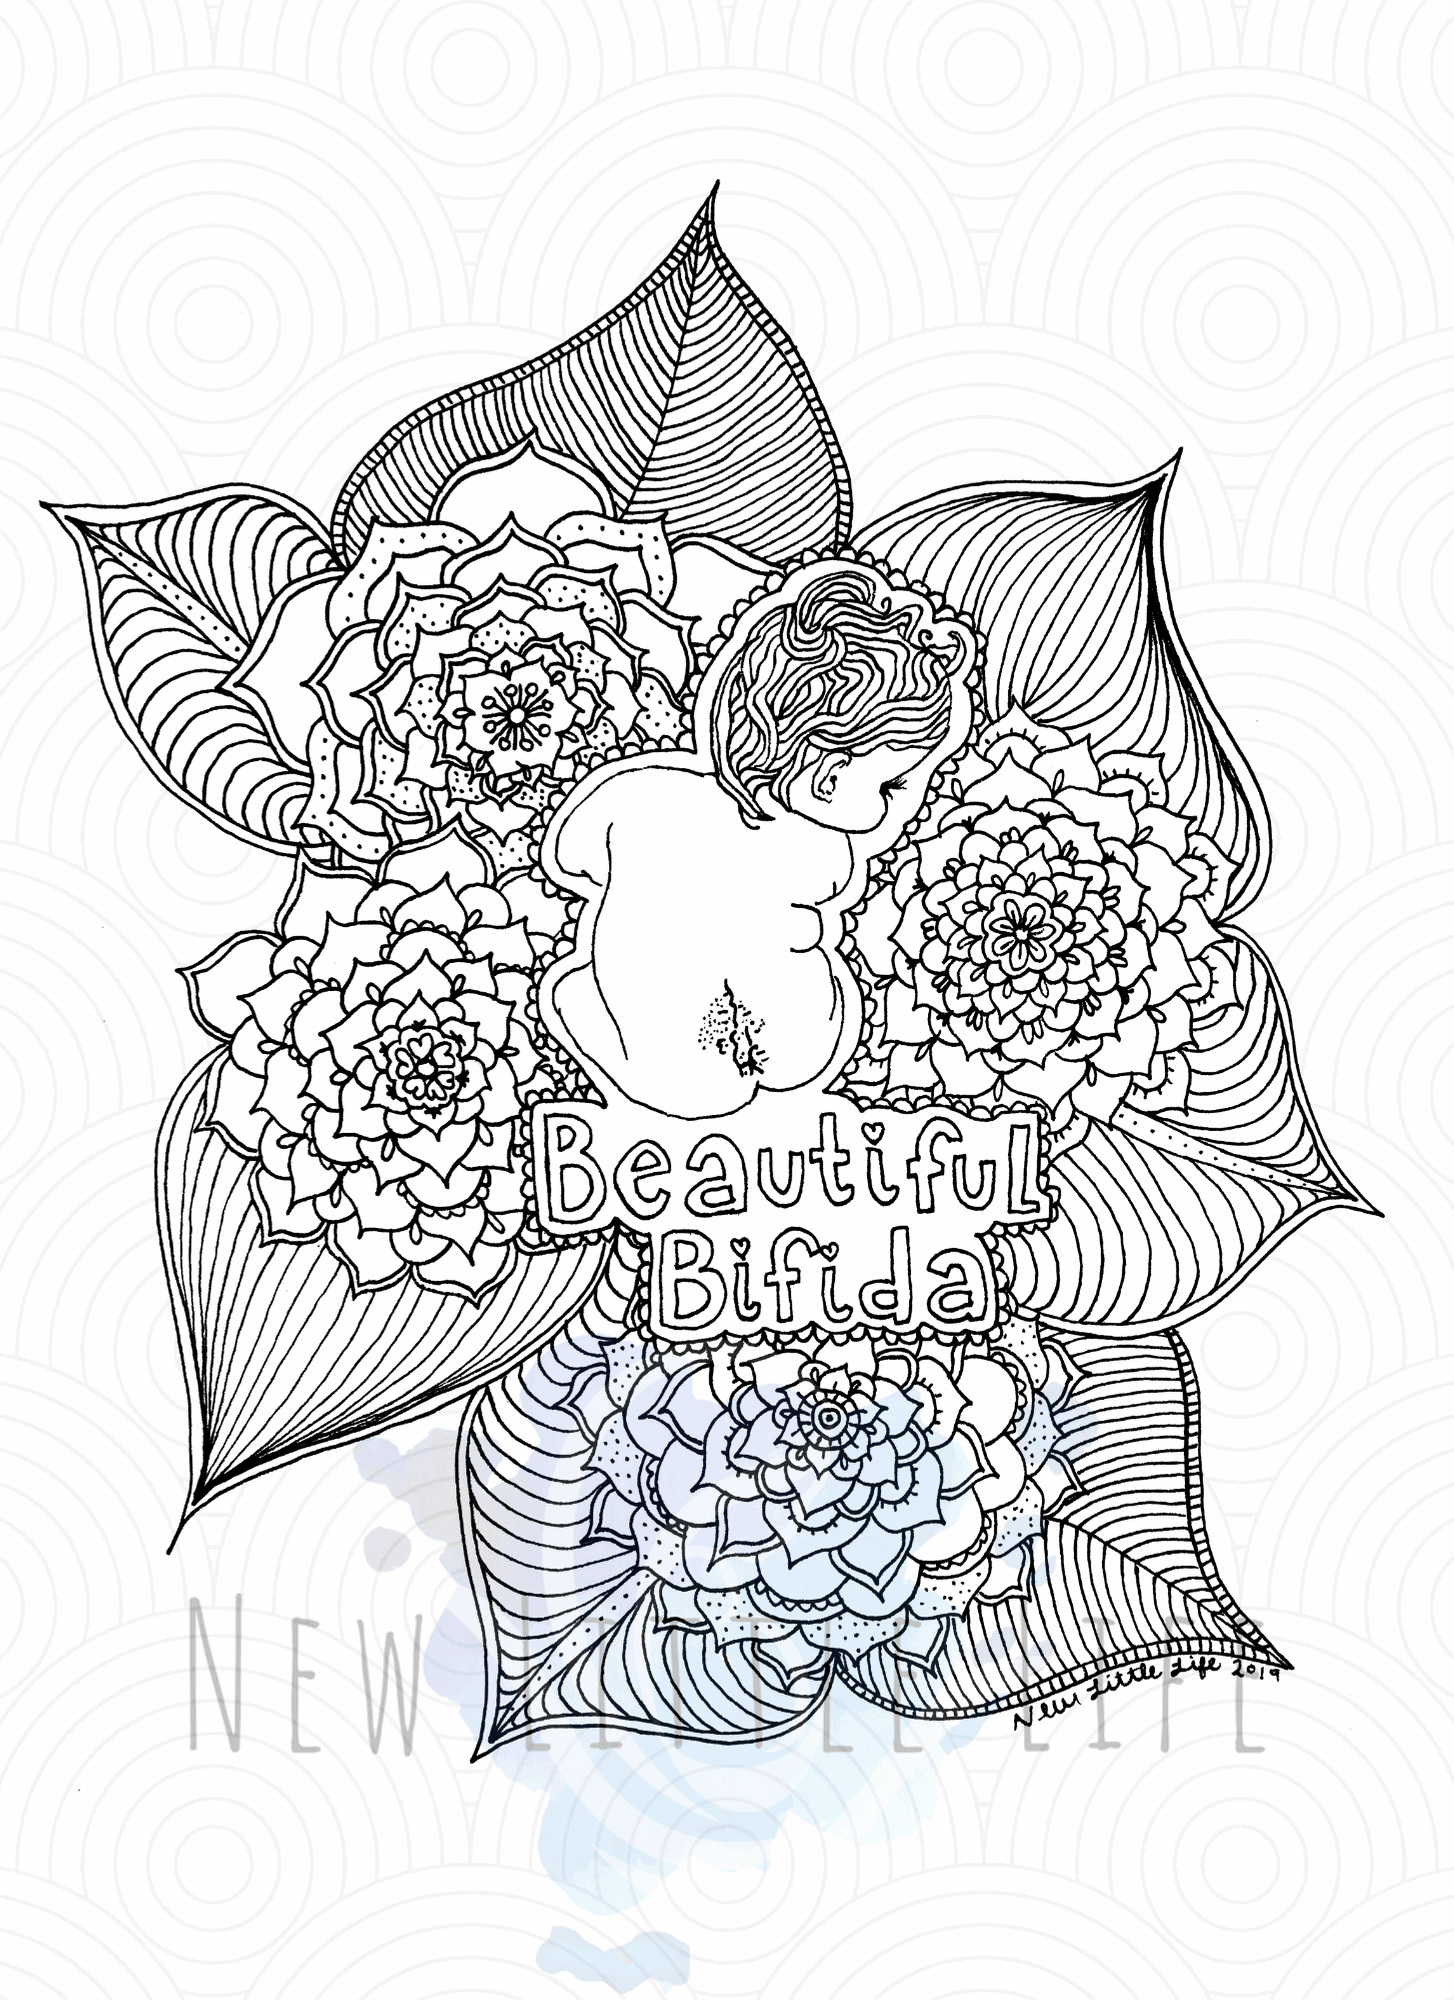 Untitled design (28)